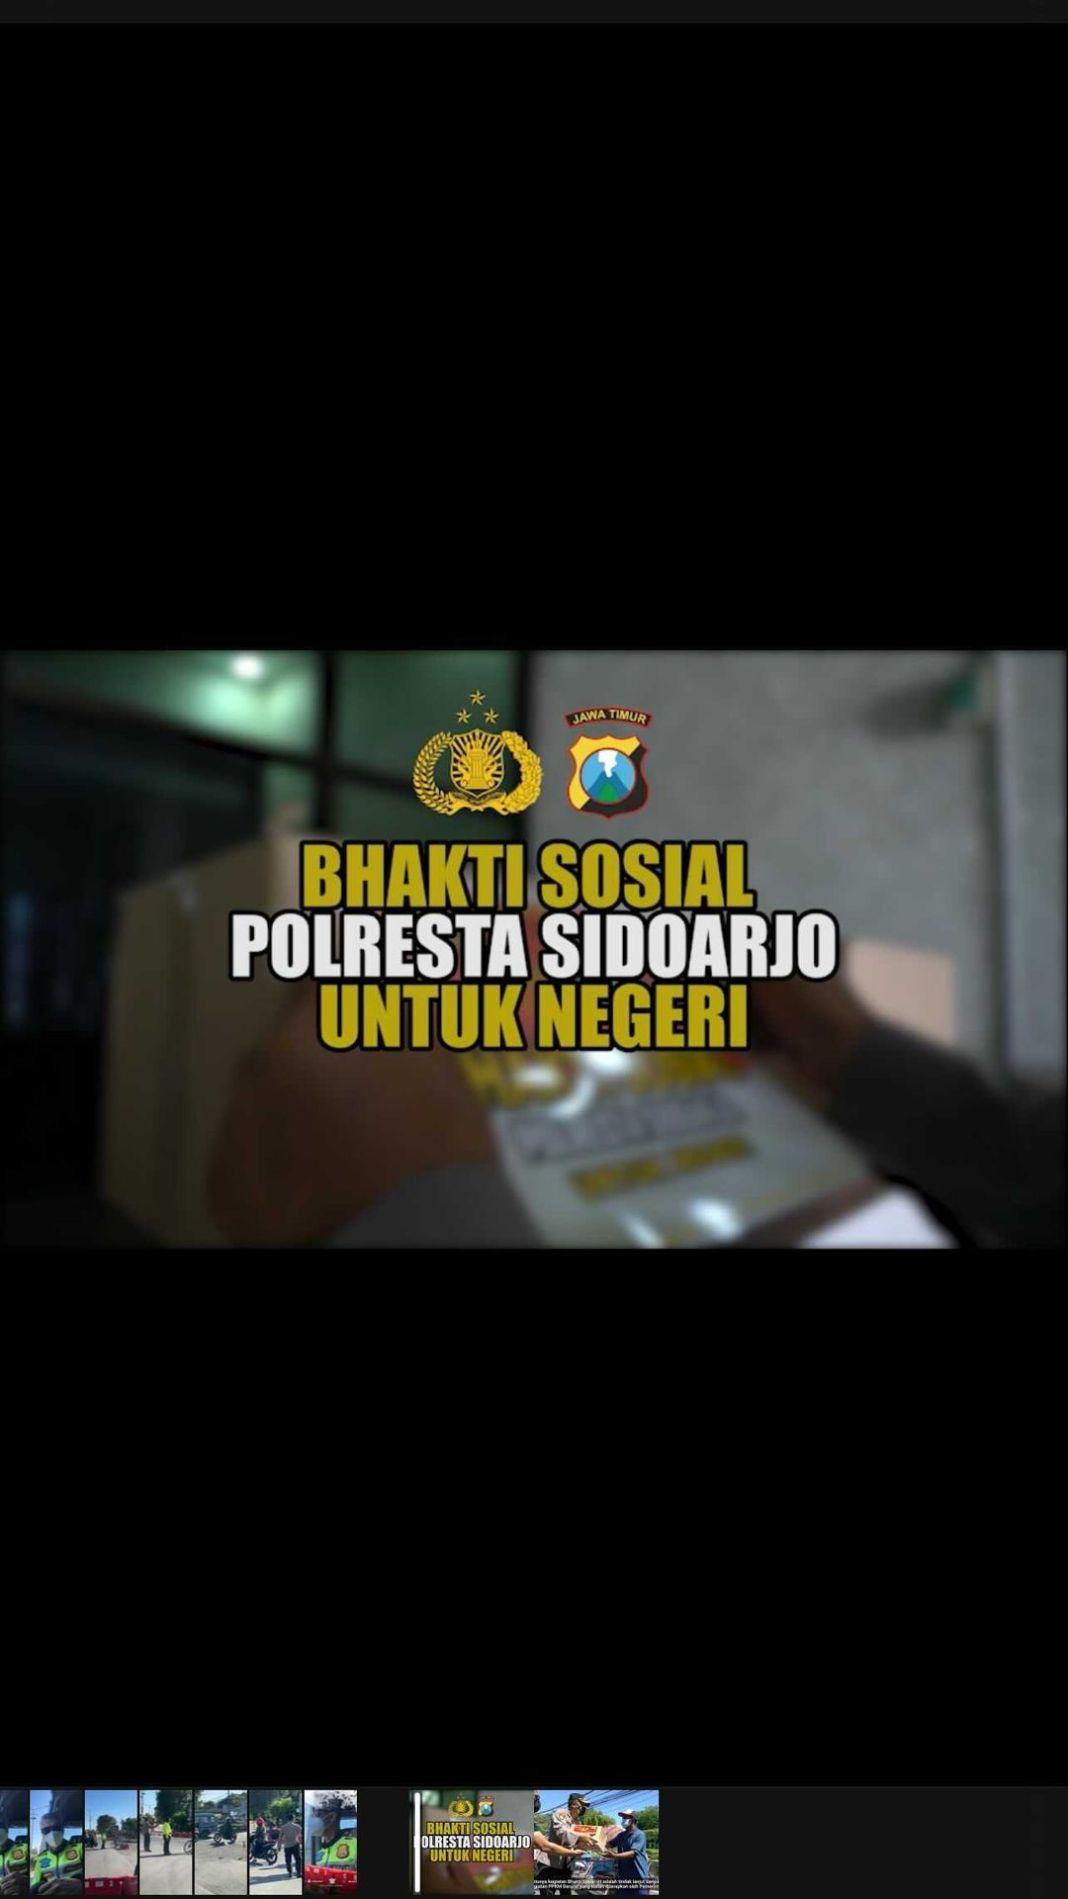 Sidoarjo, Dalam pemberlakuan PPKM DARURAT di wilayah Sidoarjo, Polresta Sidoarjo melaksanakan k…